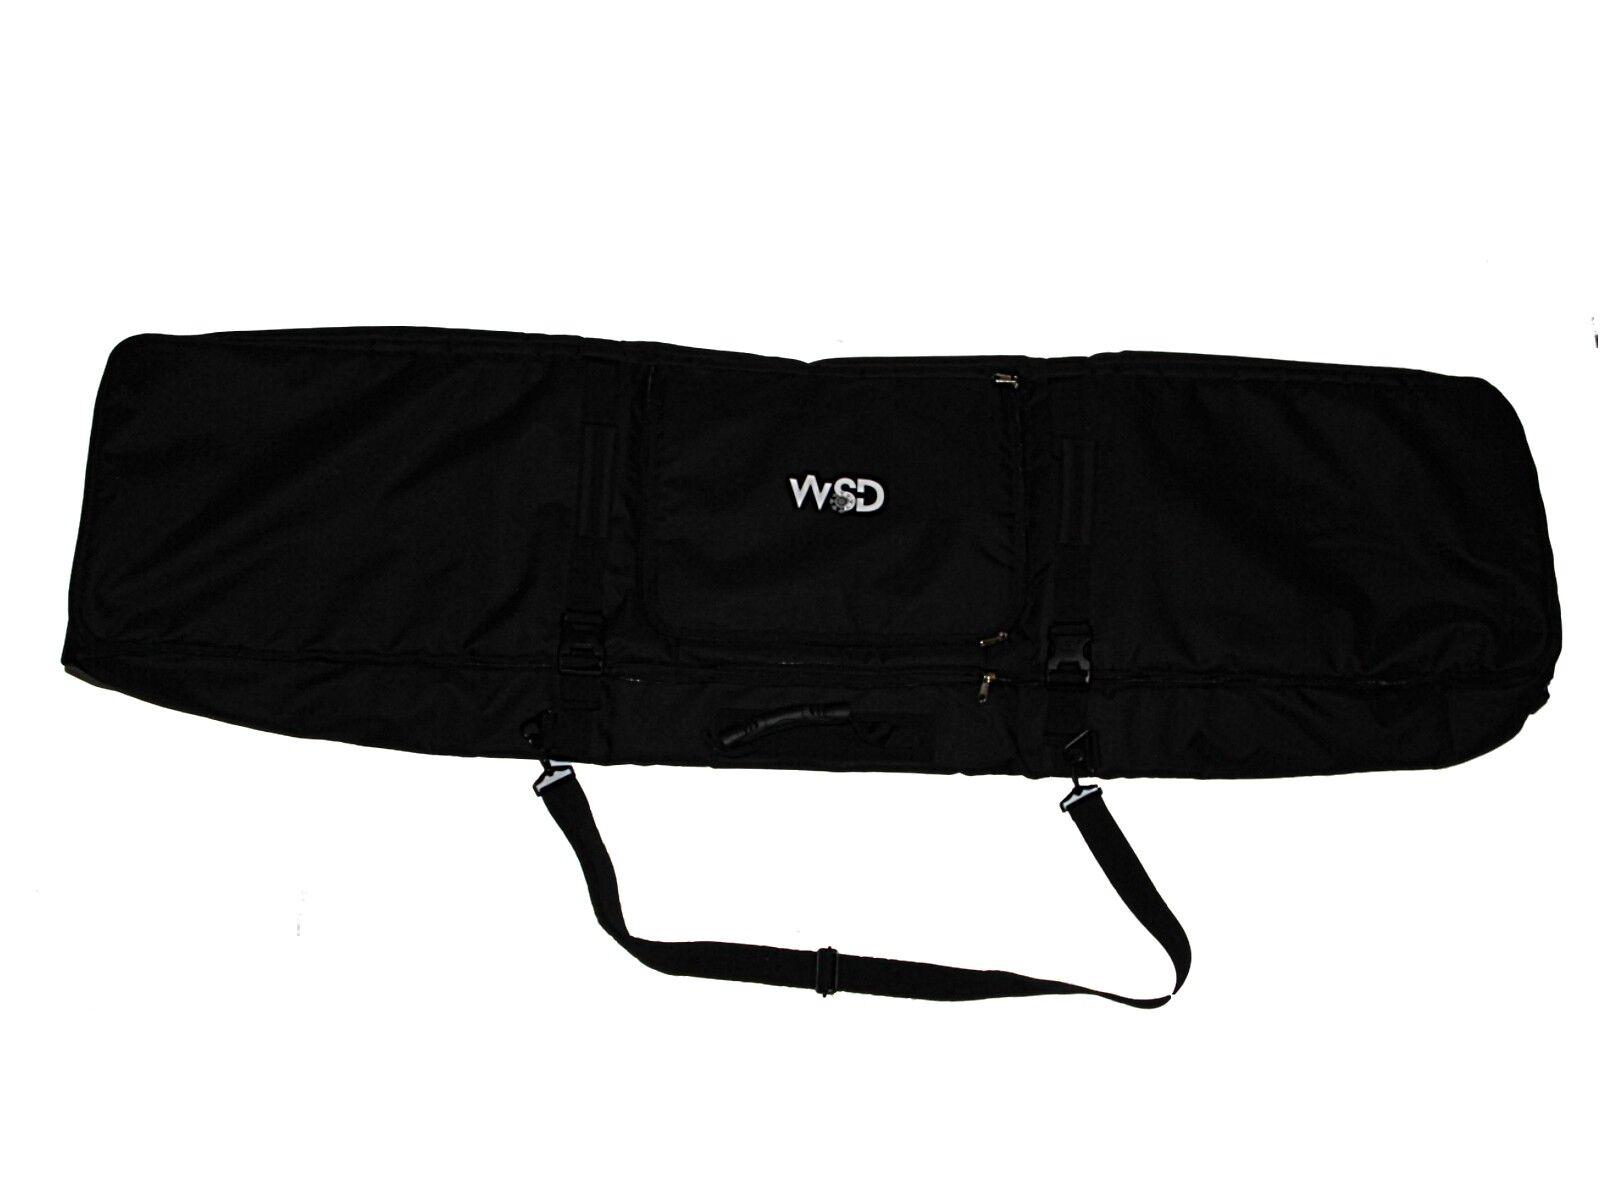 Fully Padded Travel black Ski Snowboard Bag with Wheels Wheeled WSDno box 155cm